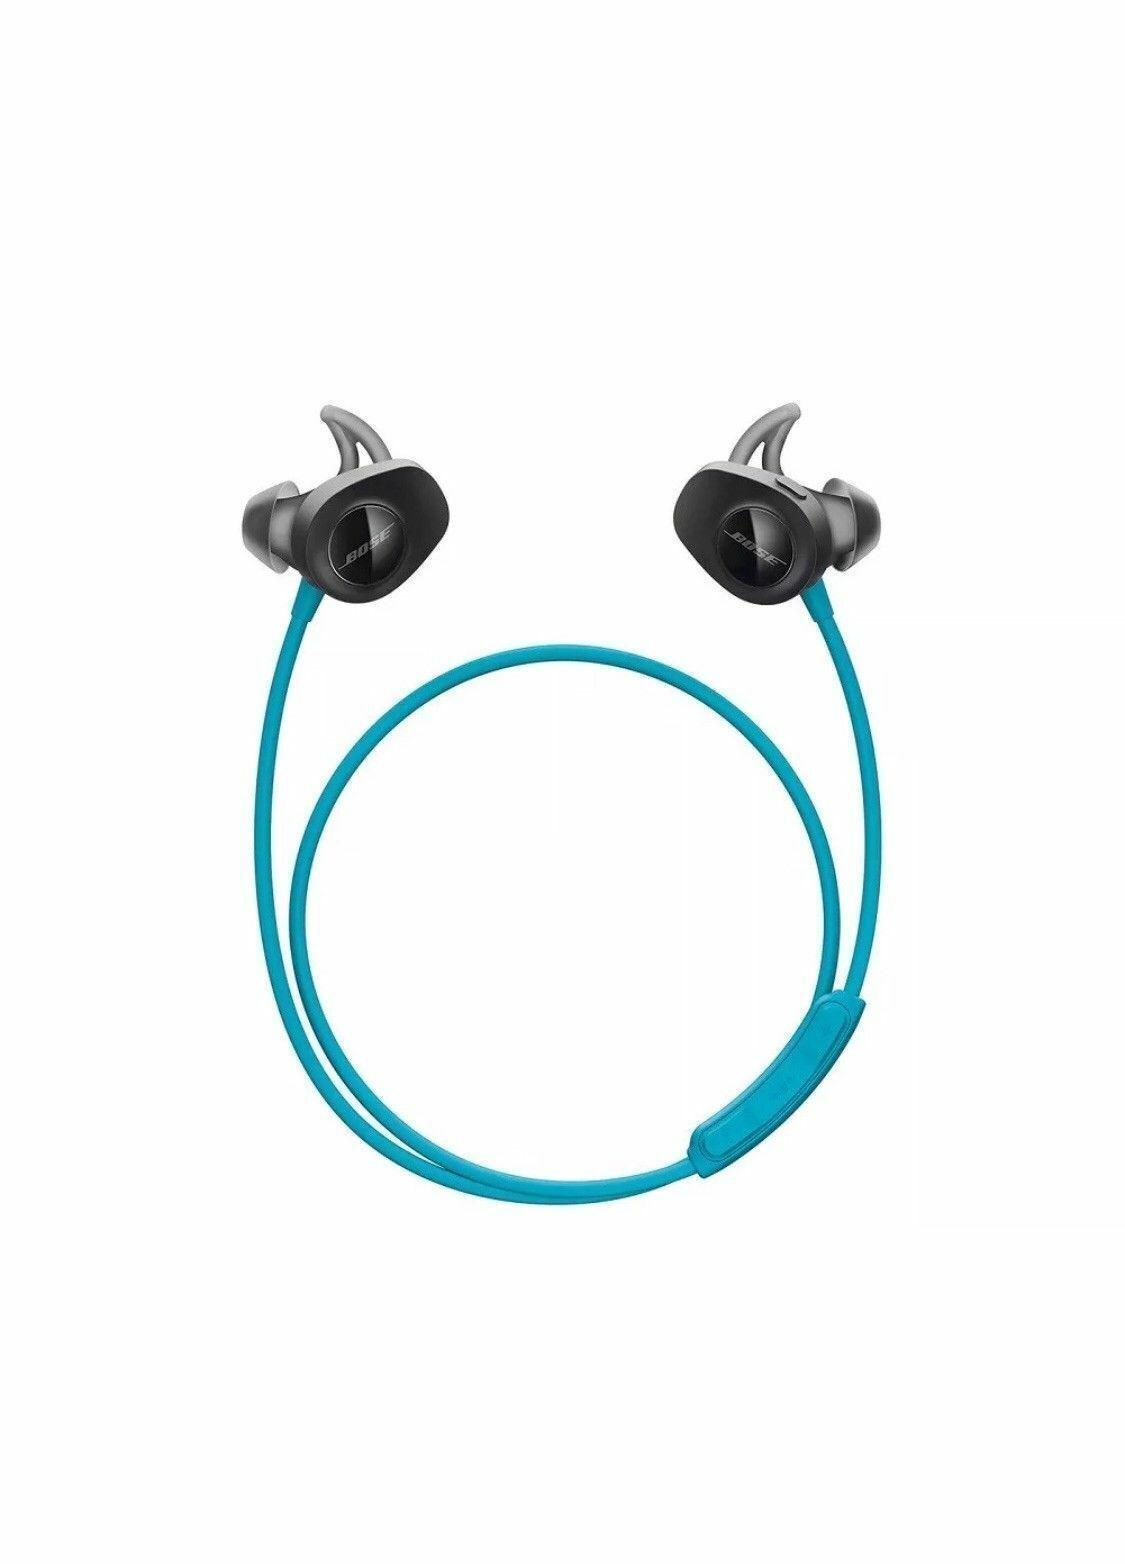 genuine bose soundsport wireless bluetooth headphones. Black Bedroom Furniture Sets. Home Design Ideas